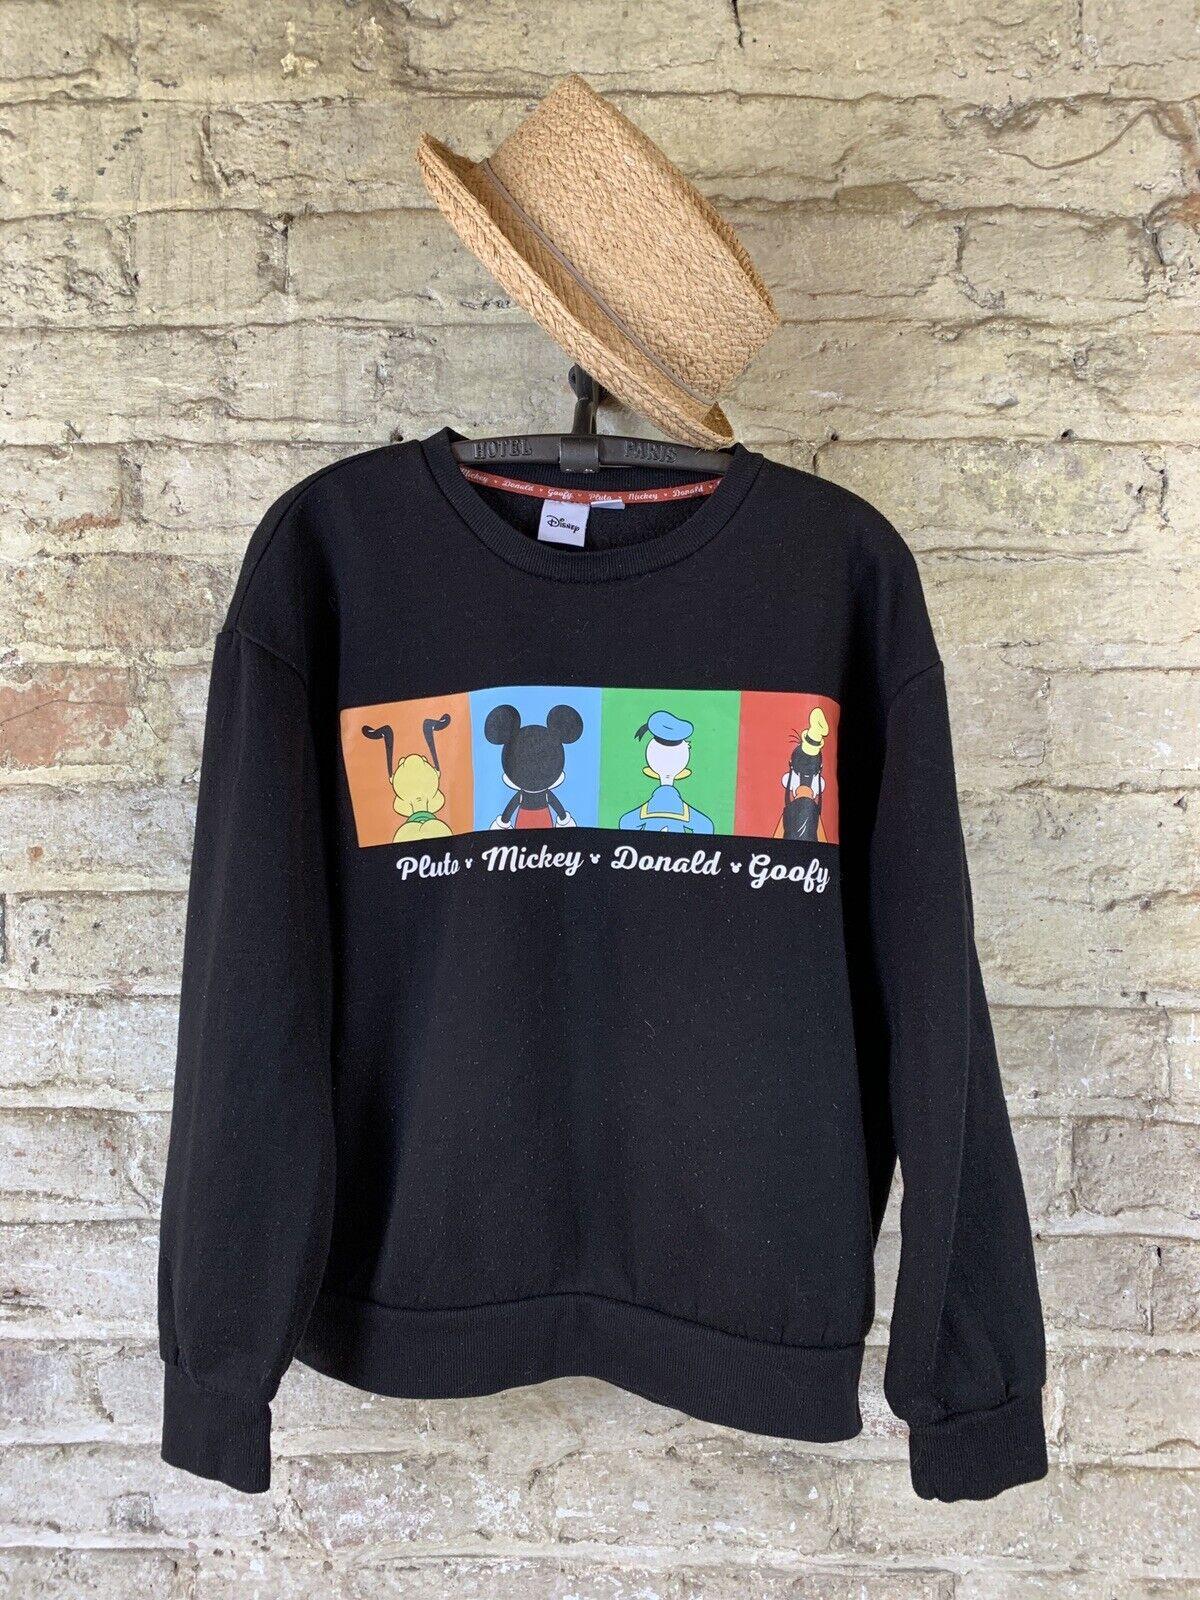 Disney Crew Neck Sweatshirt Woman Size 12/14 M Black Pluto Mickey Donald Goofy